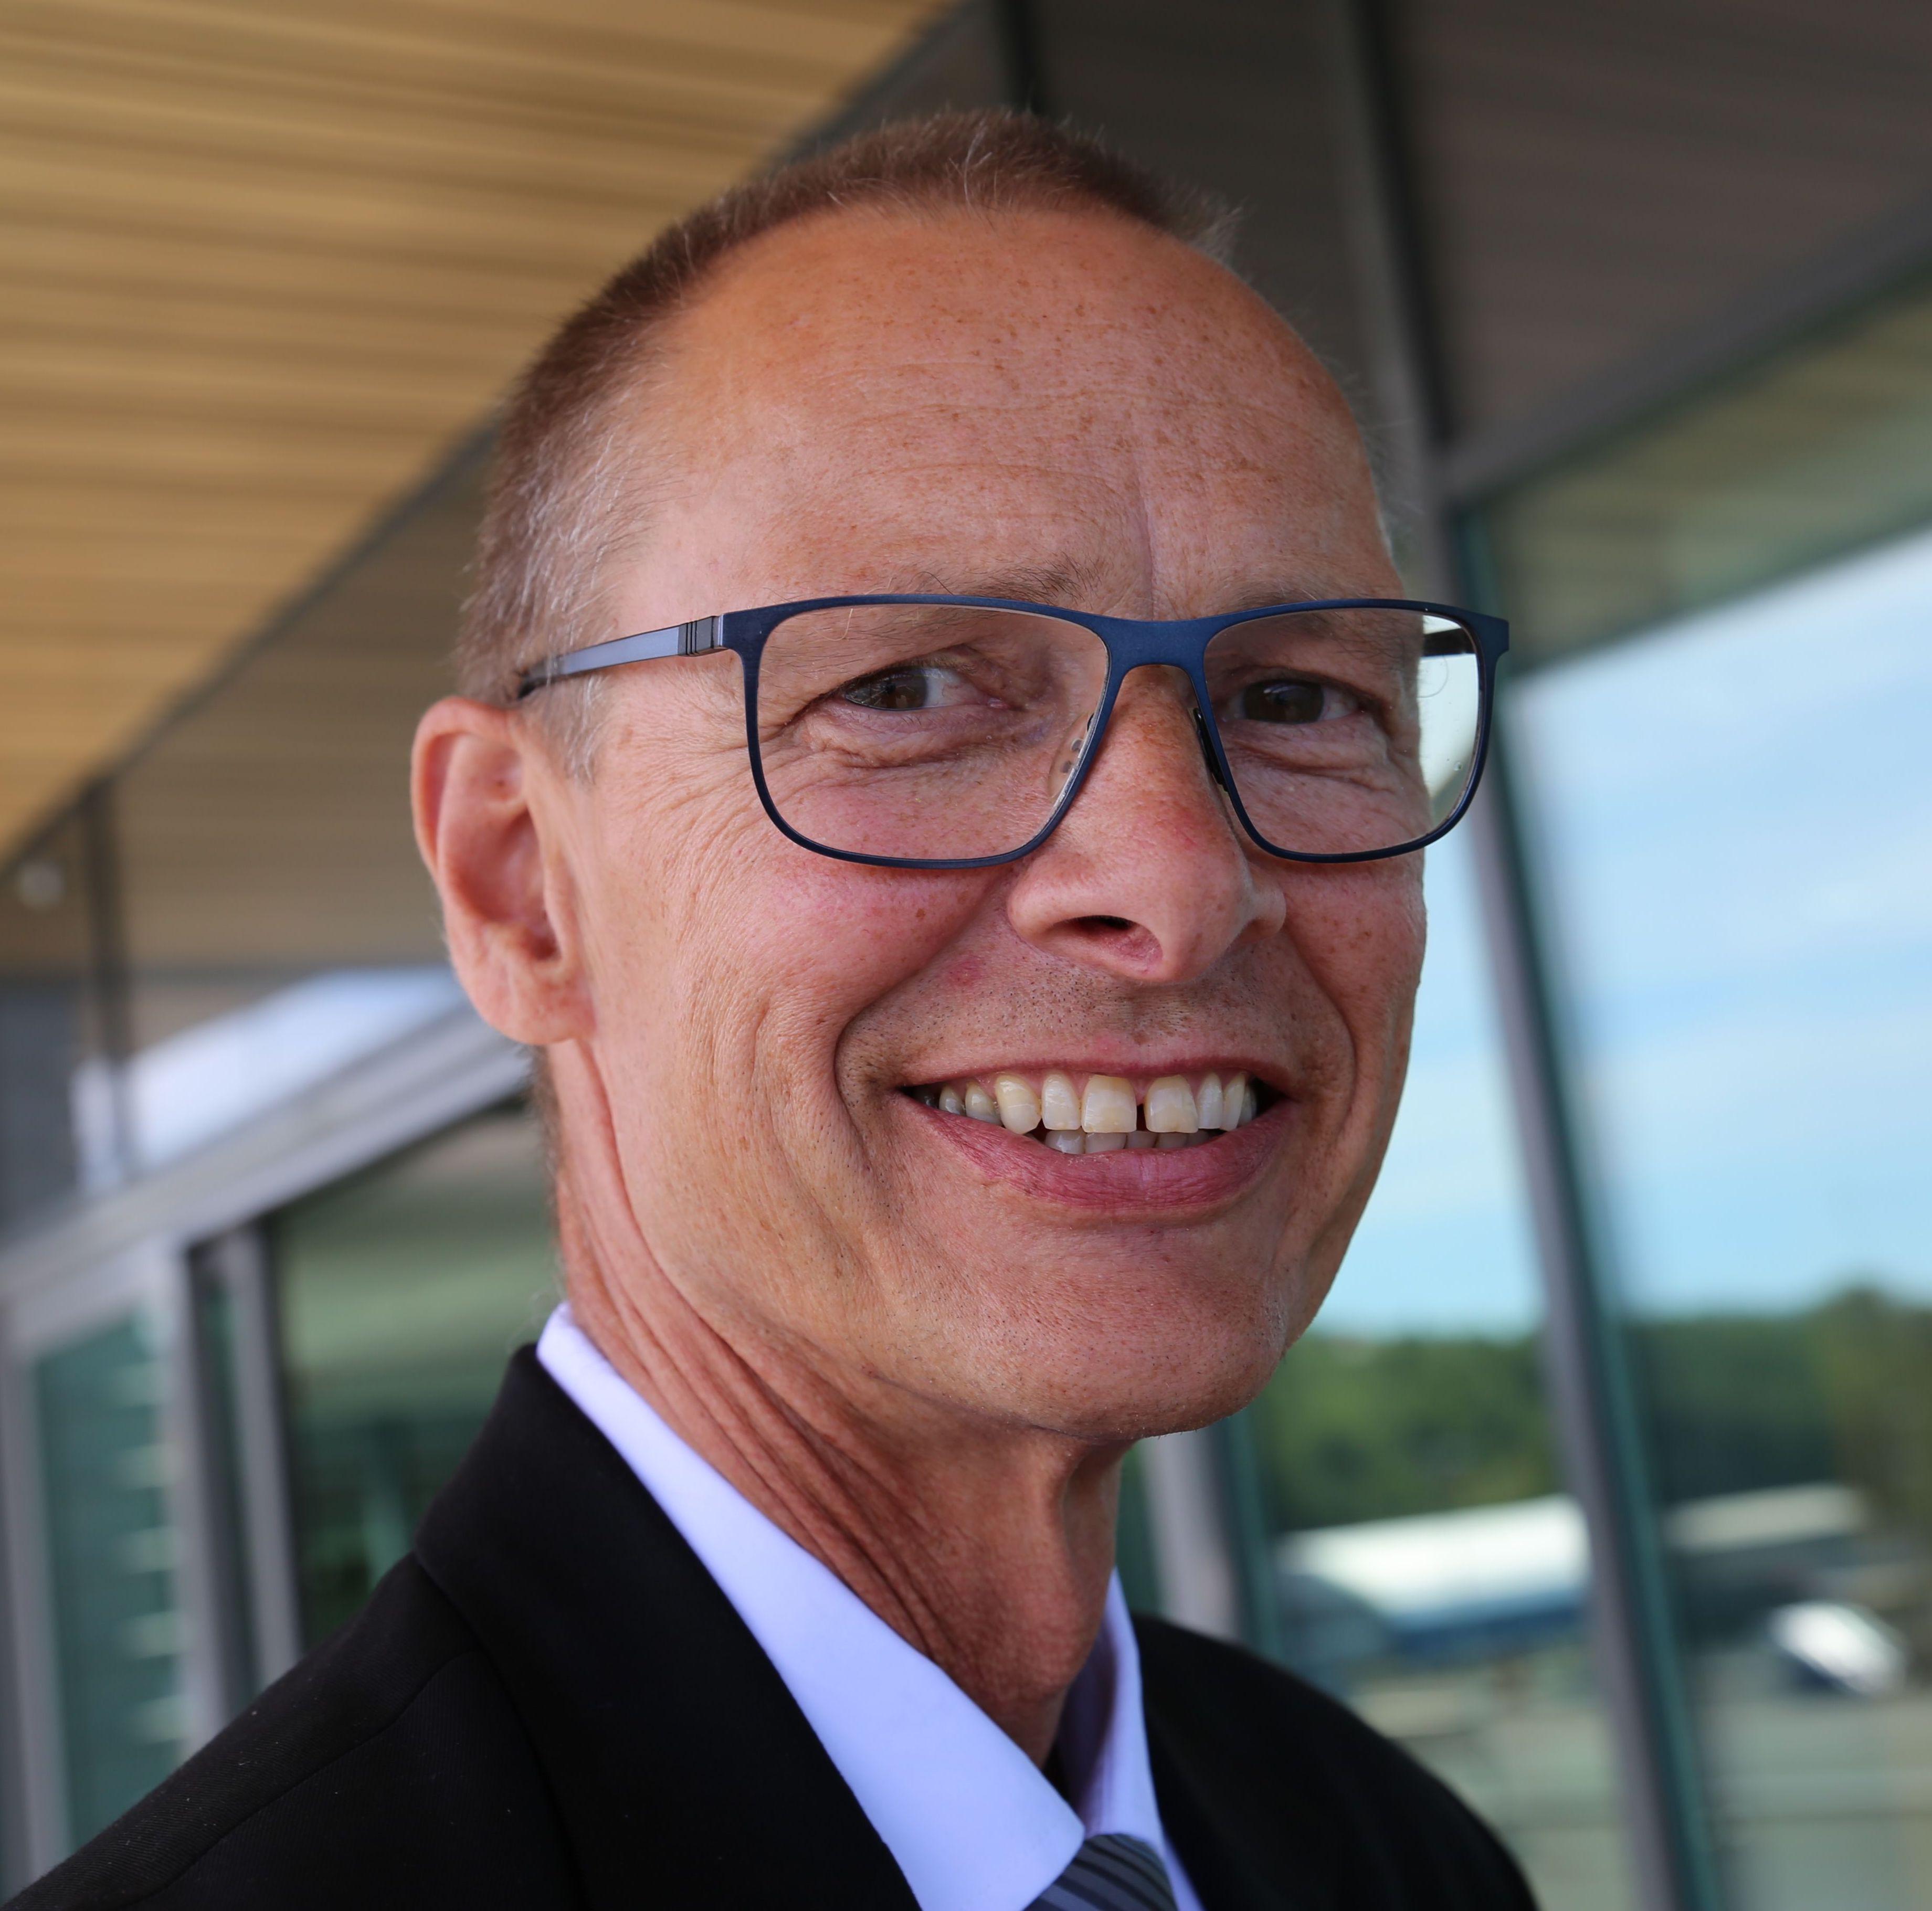 Trond Petter Abrahamsen